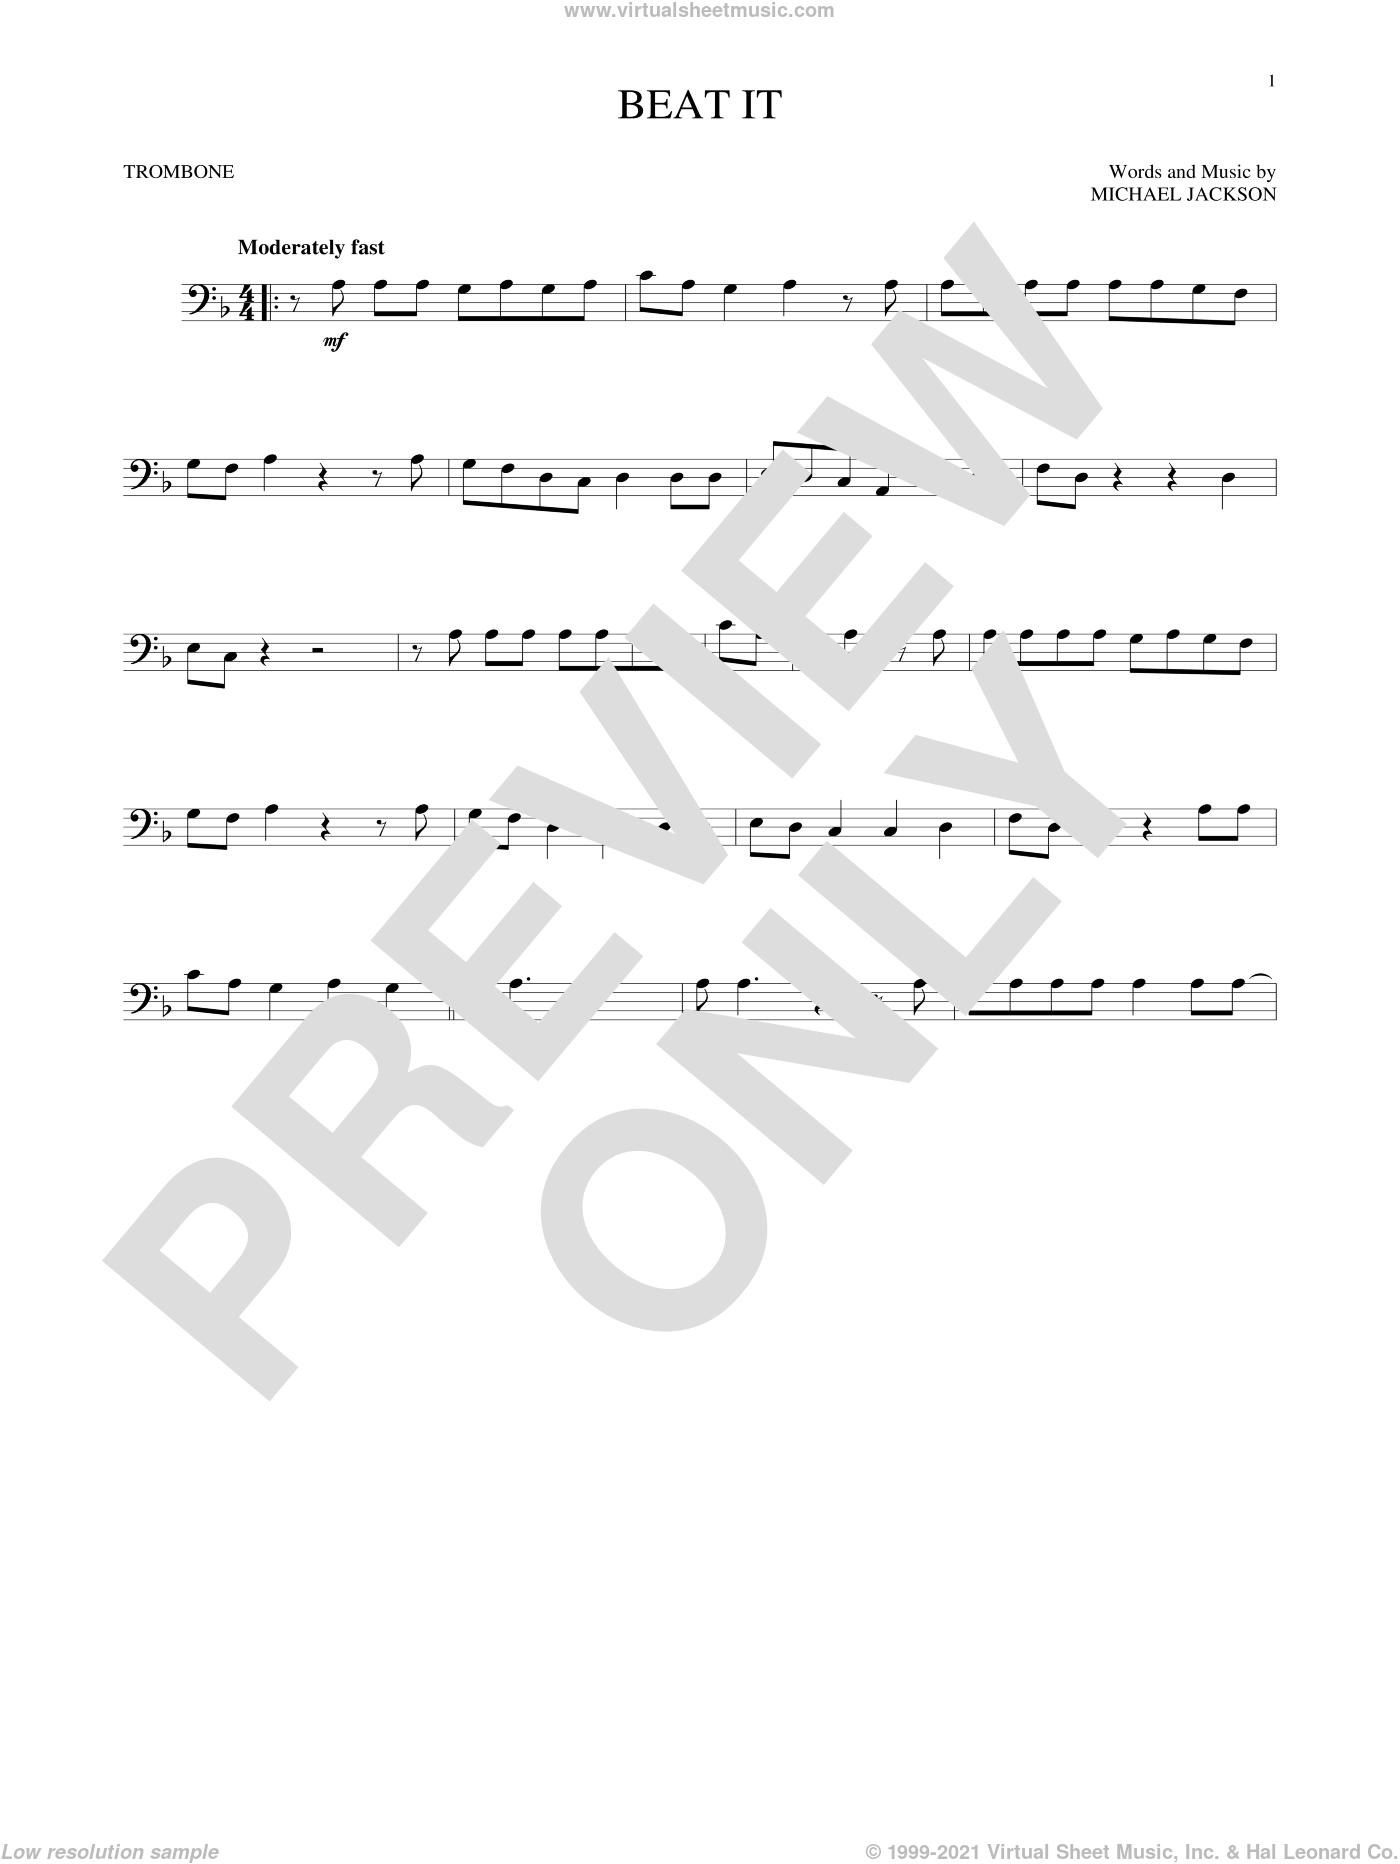 Beat It sheet music for trombone solo by Michael Jackson, intermediate skill level